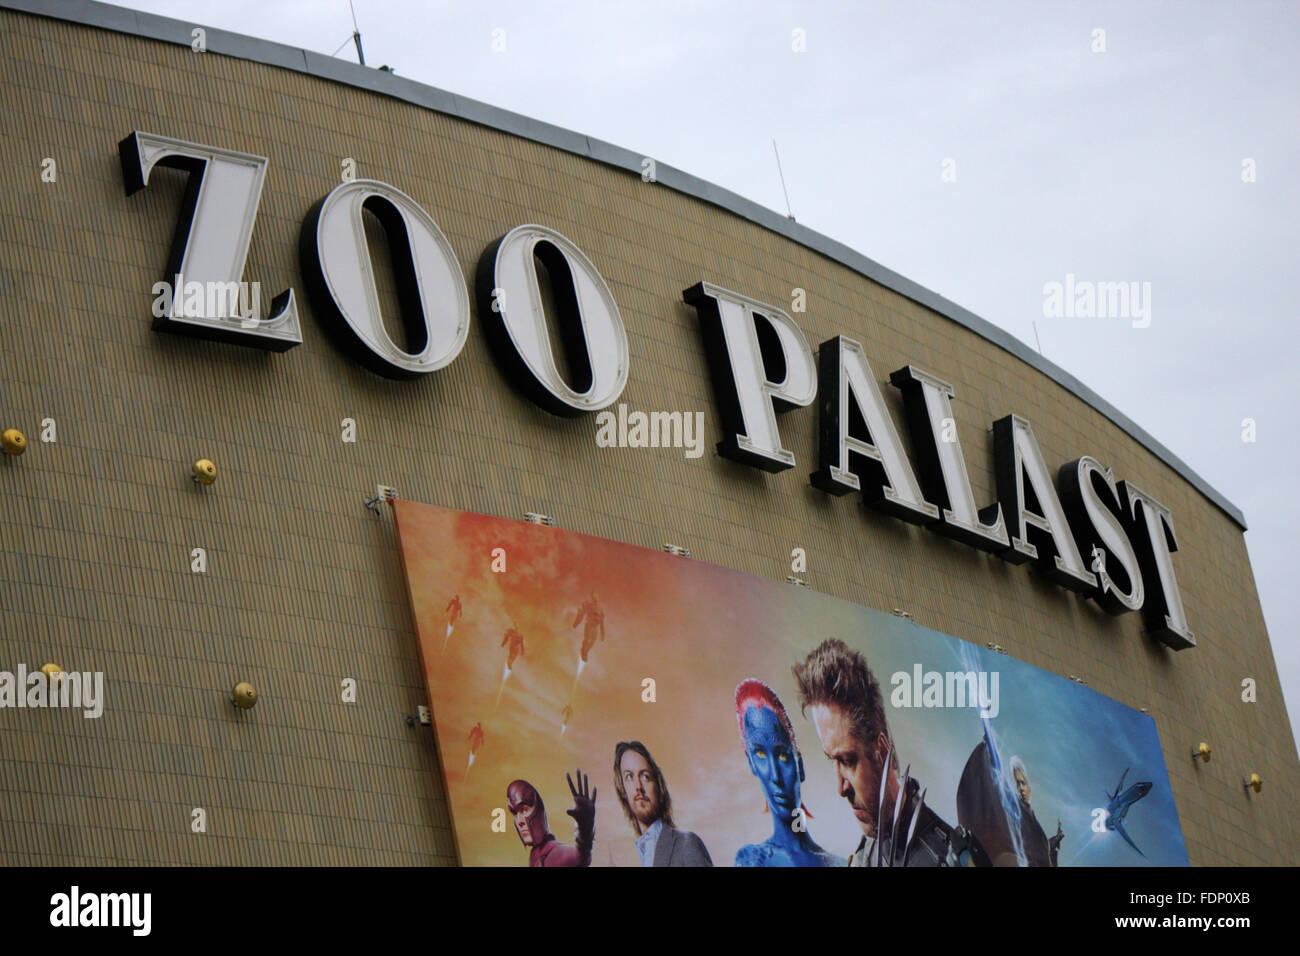 Zoo Palast, Berlin-Charlottenburg. - Stock Image